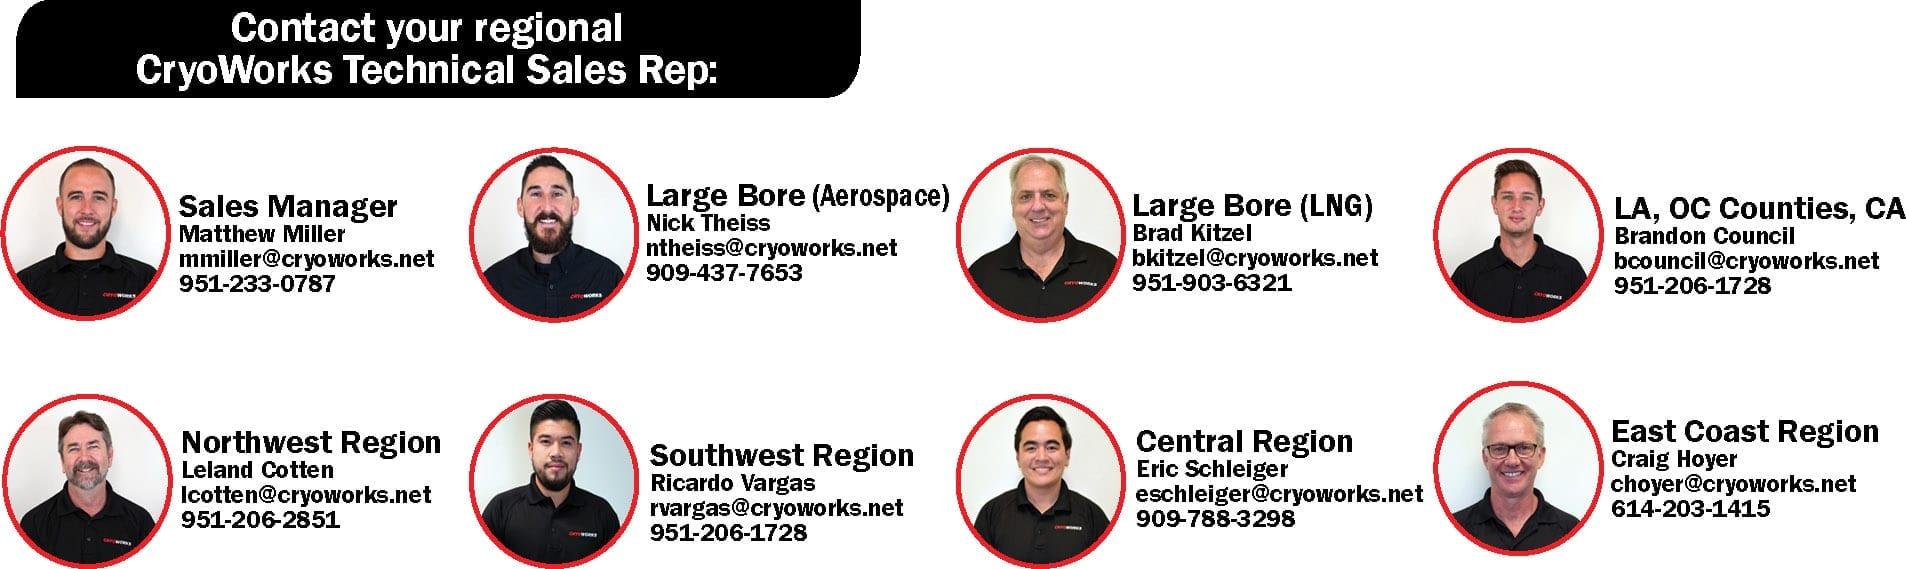 CryoWorks Technical Sales Rep Team Members